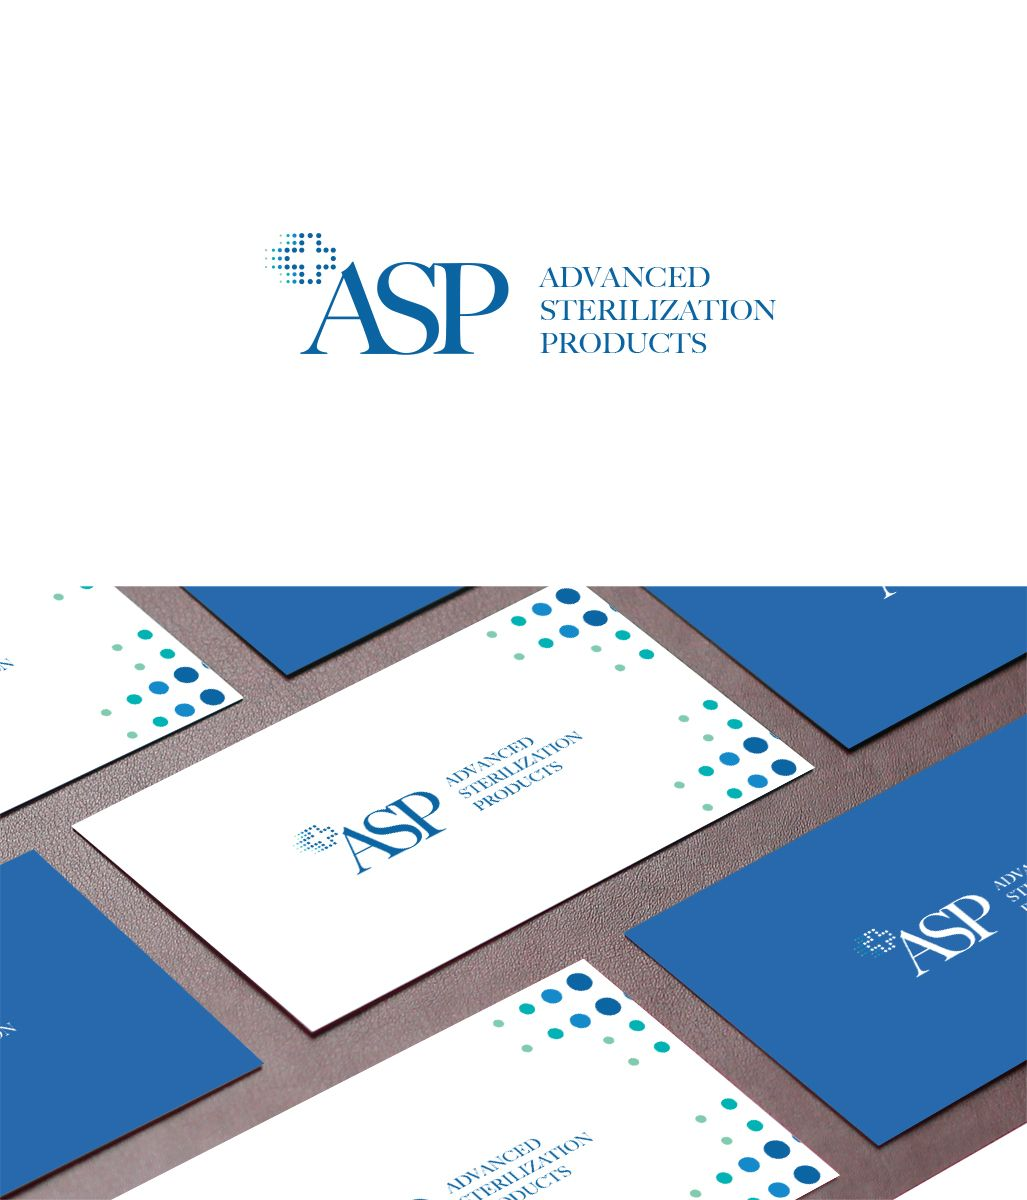 Freelance Logo Design Web Design Graphic Design Designcrowd In 2020 Web Design Logo Design Inspiration Logo Design